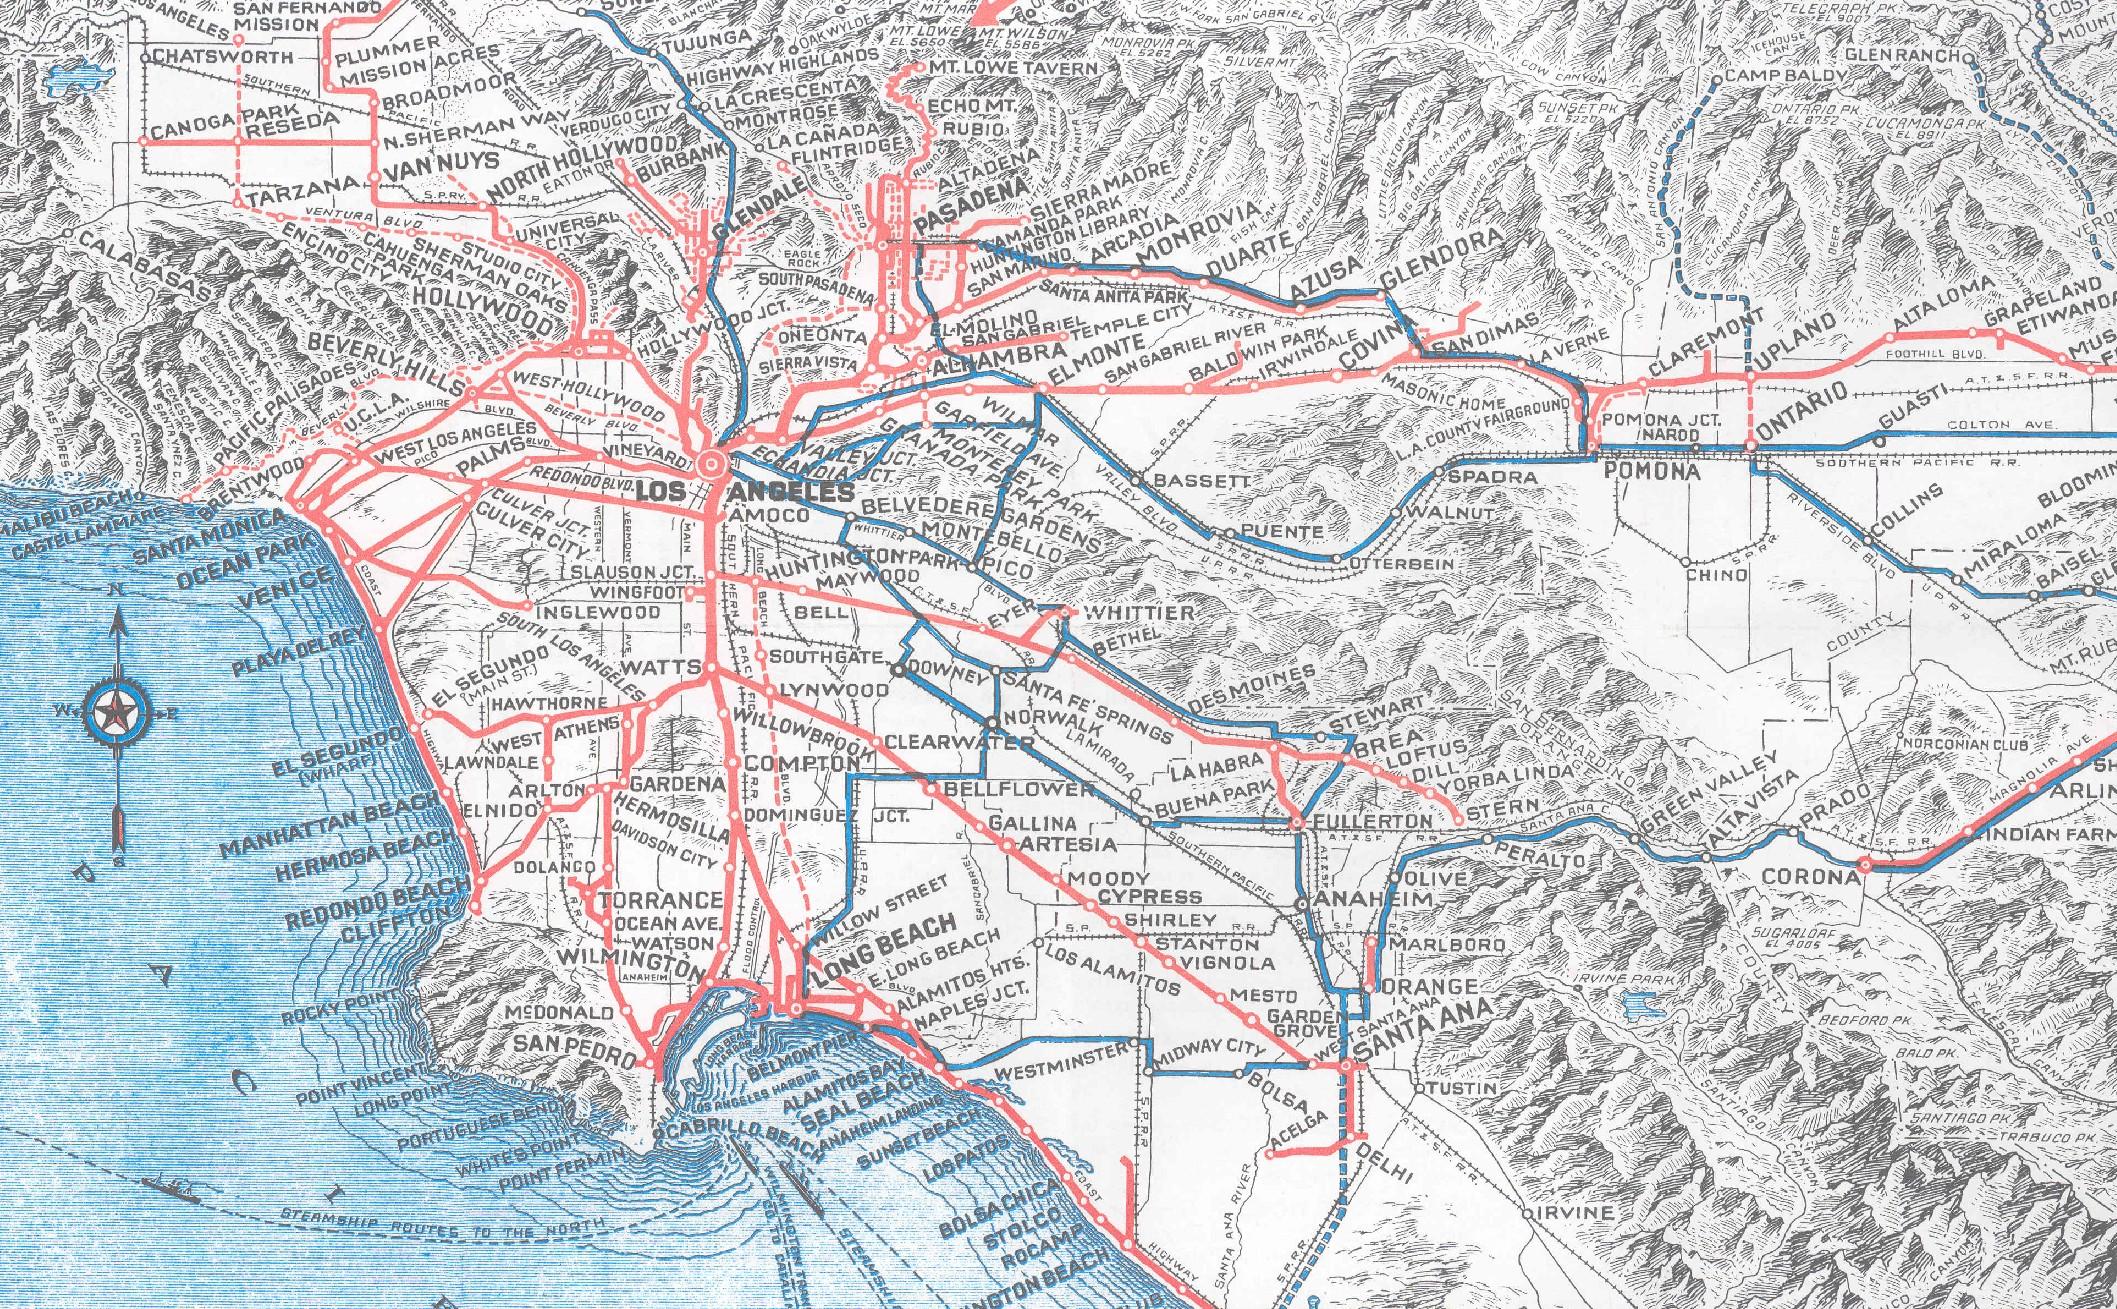 Drawn power line city los angeles Pacific Percent jpg 1925